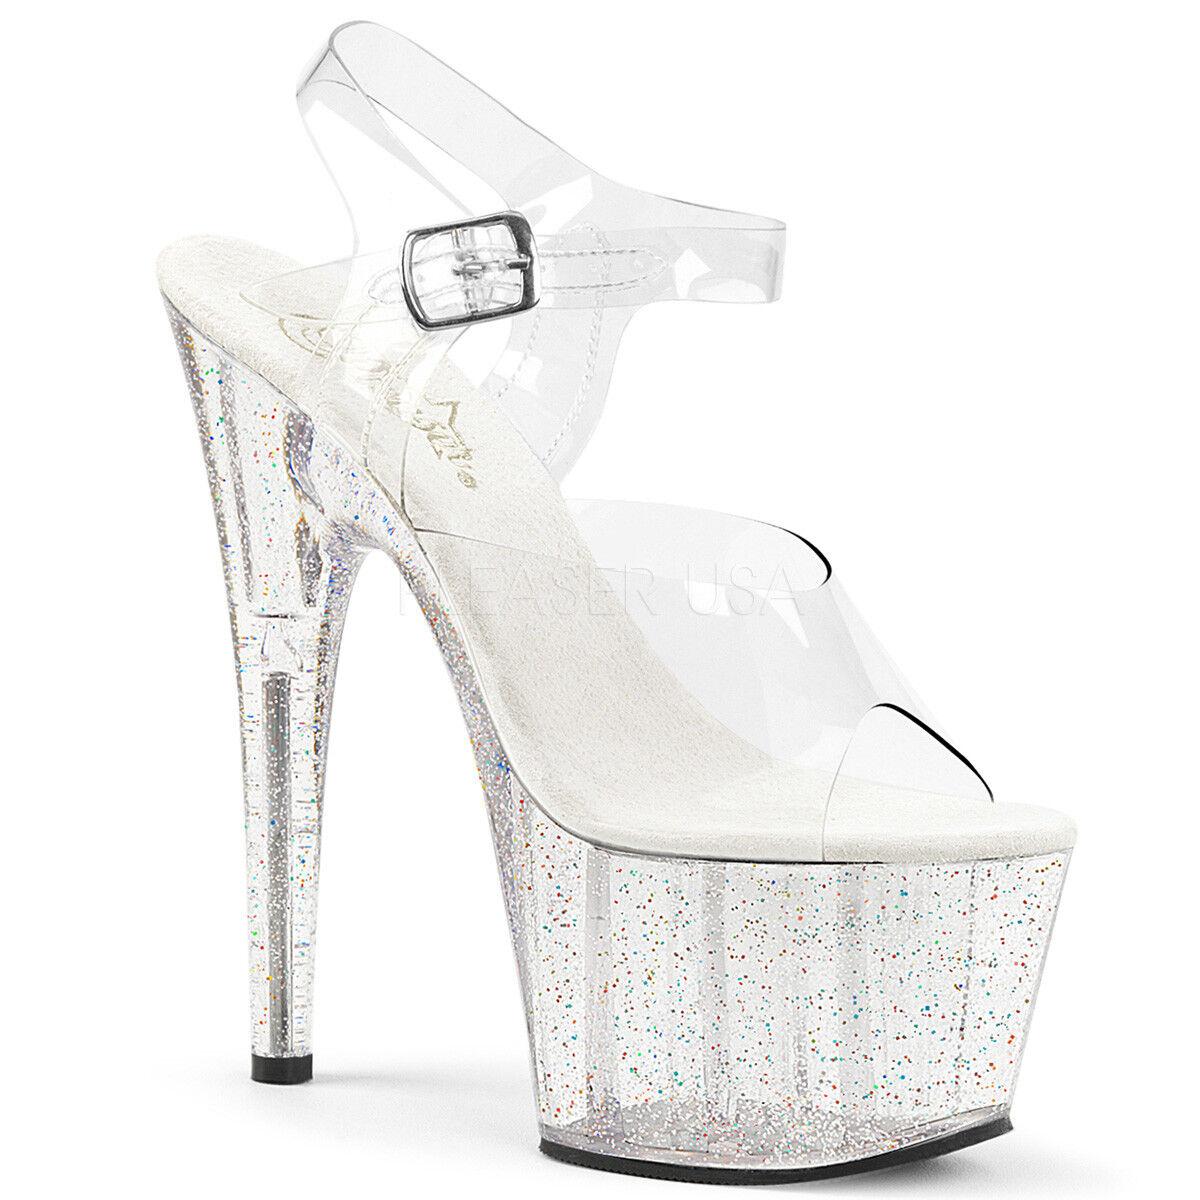 PLEASER ADORE 708MG CLEAR PLATFORM POLE DANCING STILETTO HEEL SANDALS Schuhe